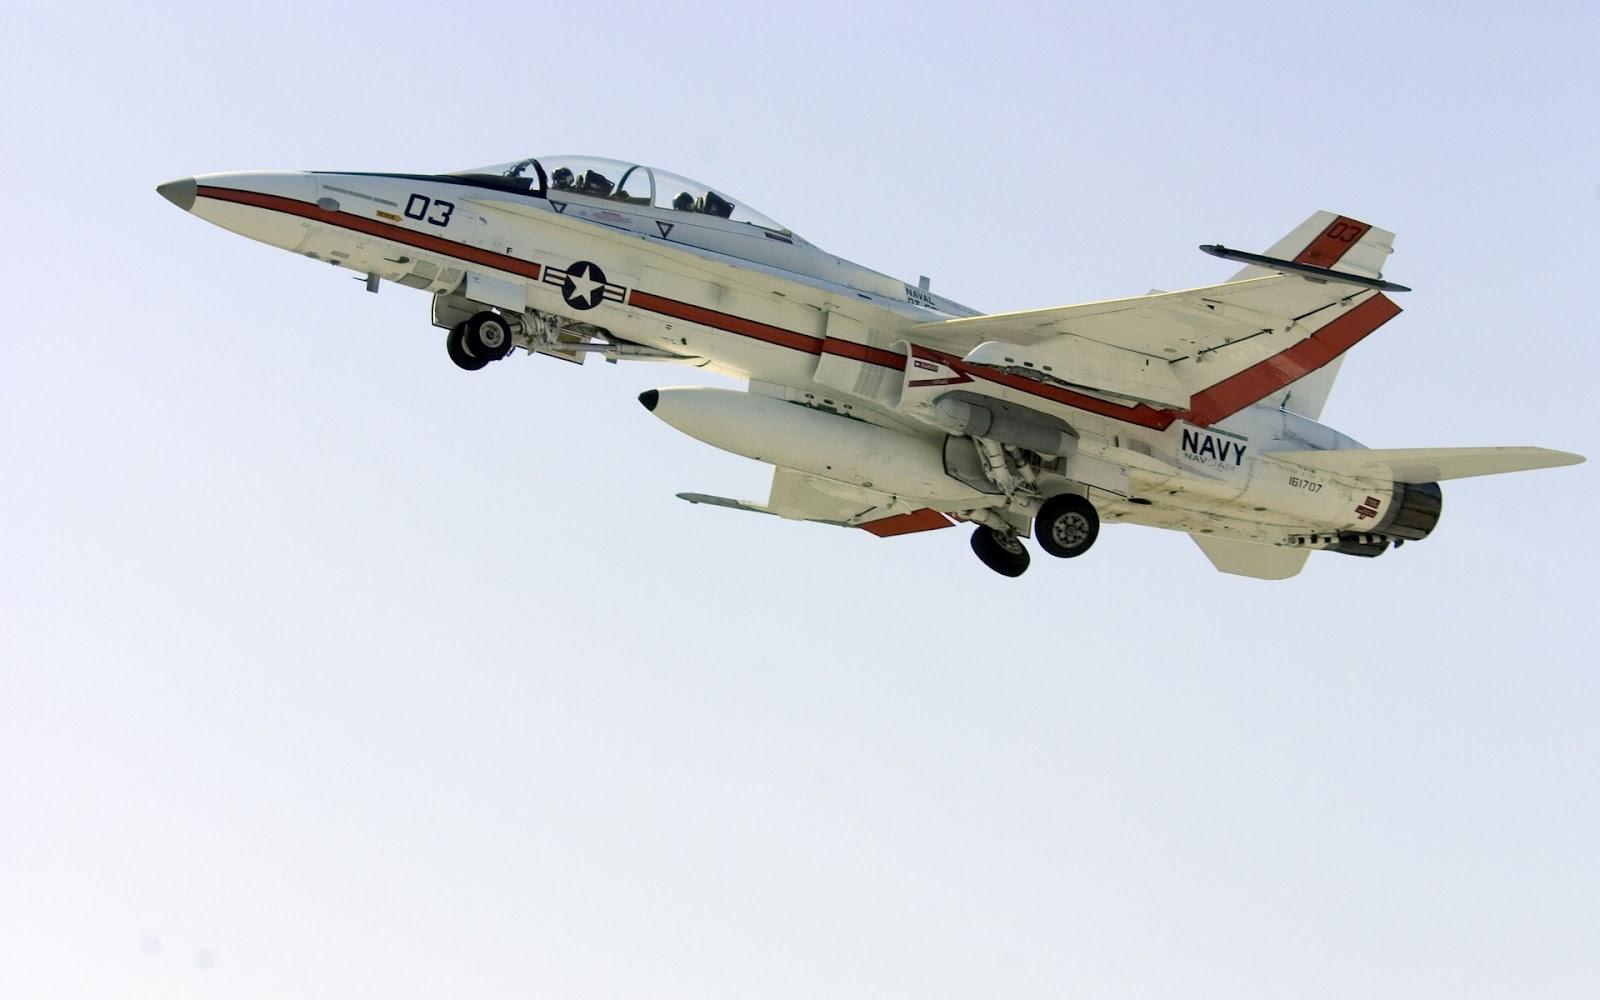 http://4.bp.blogspot.com/-C5ZgEa54pqI/UEIGWseriBI/AAAAAAAAjpM/DjABCSph-VE/s1600/F-18-Avion-de-Combate_Fondos-de-Pantalla-HD-de-Aviones.jpg